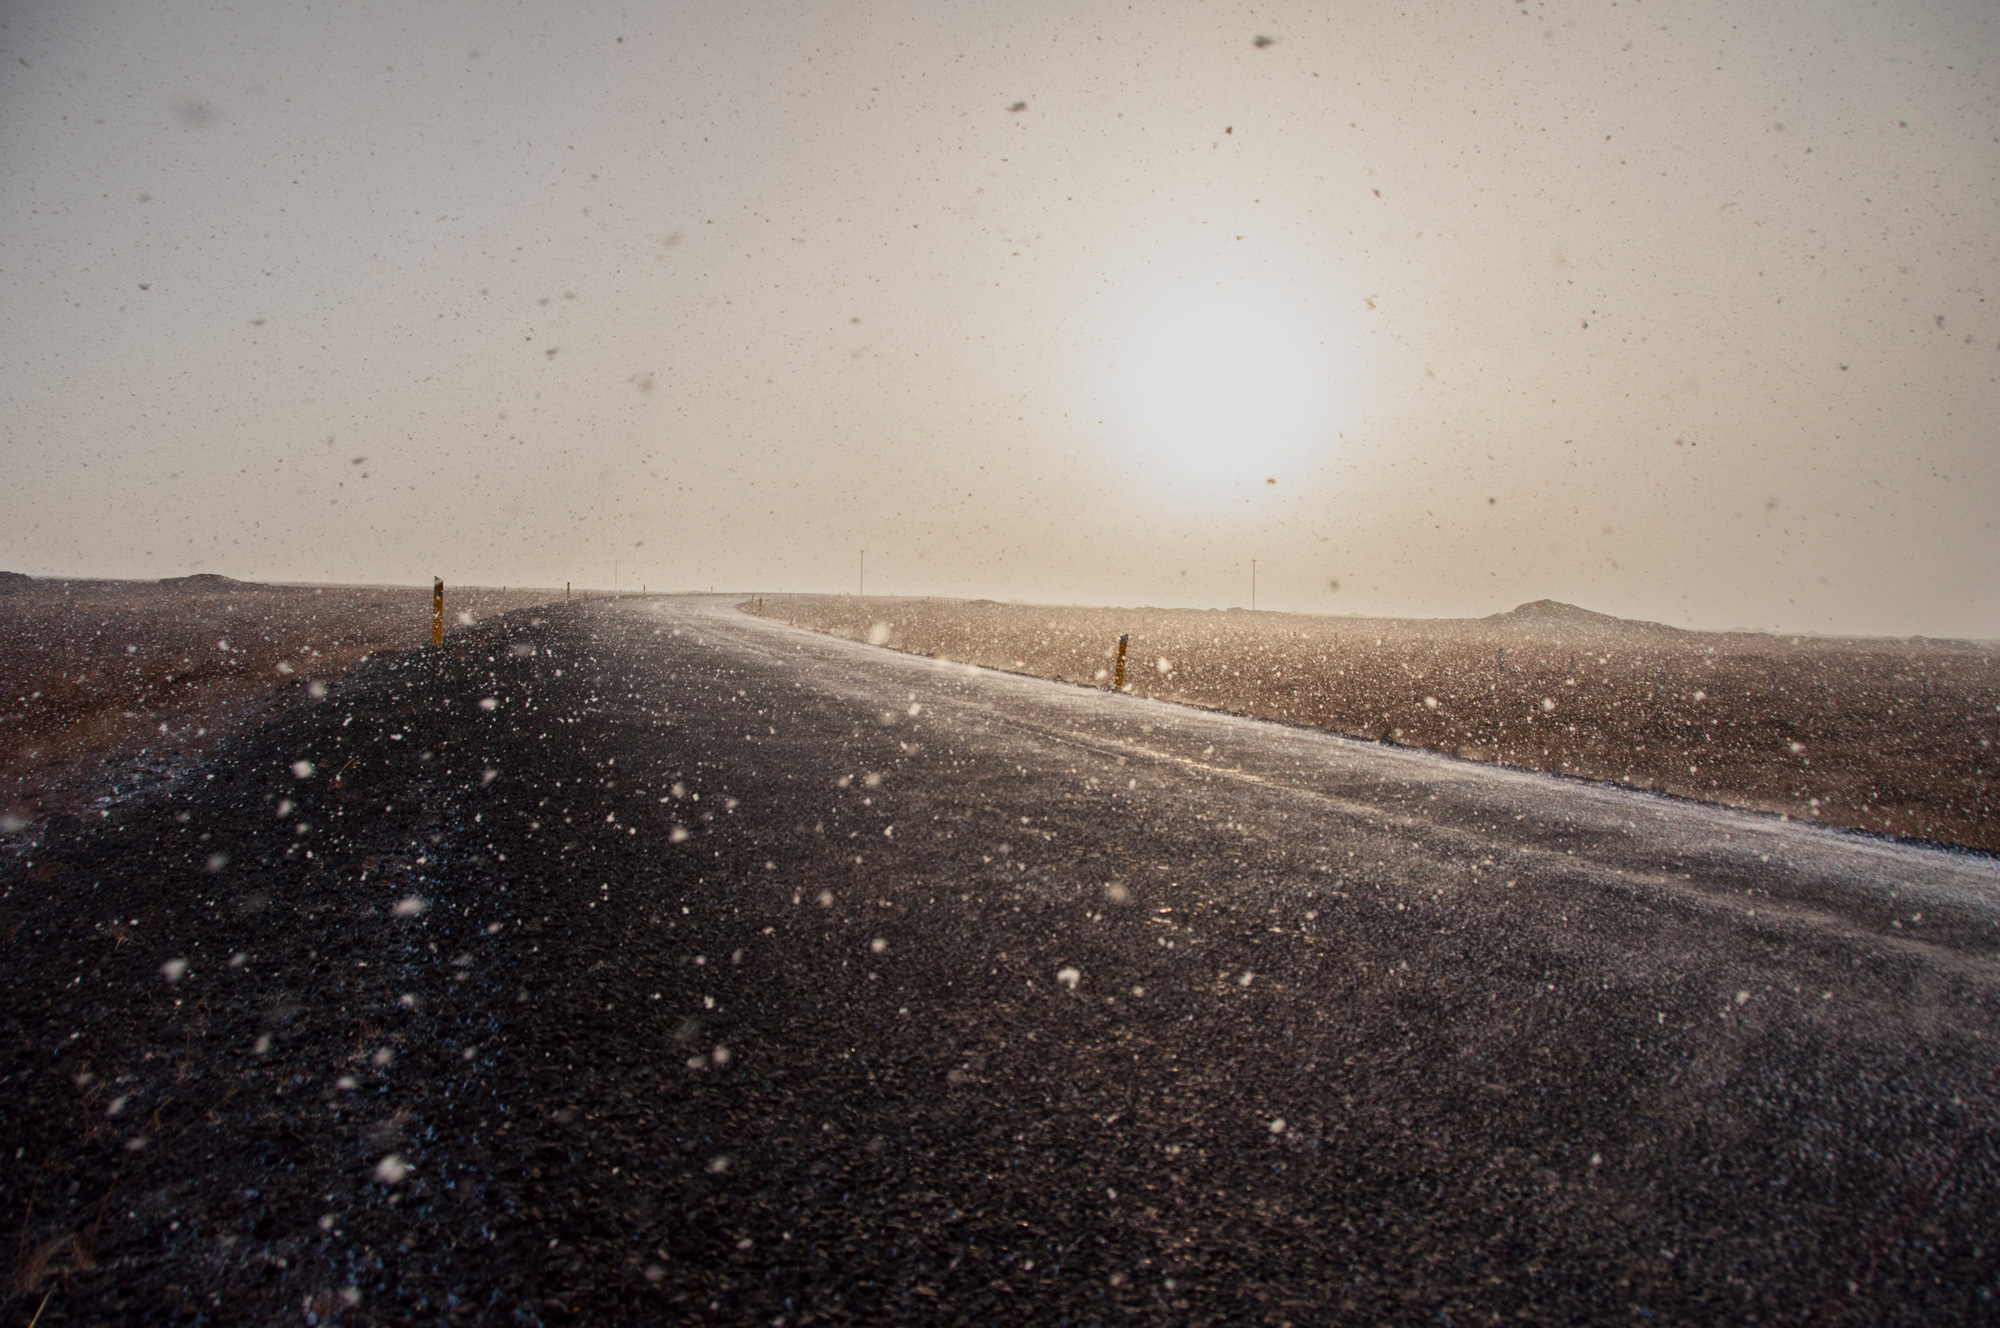 planx-iceland-fotoreportage23d